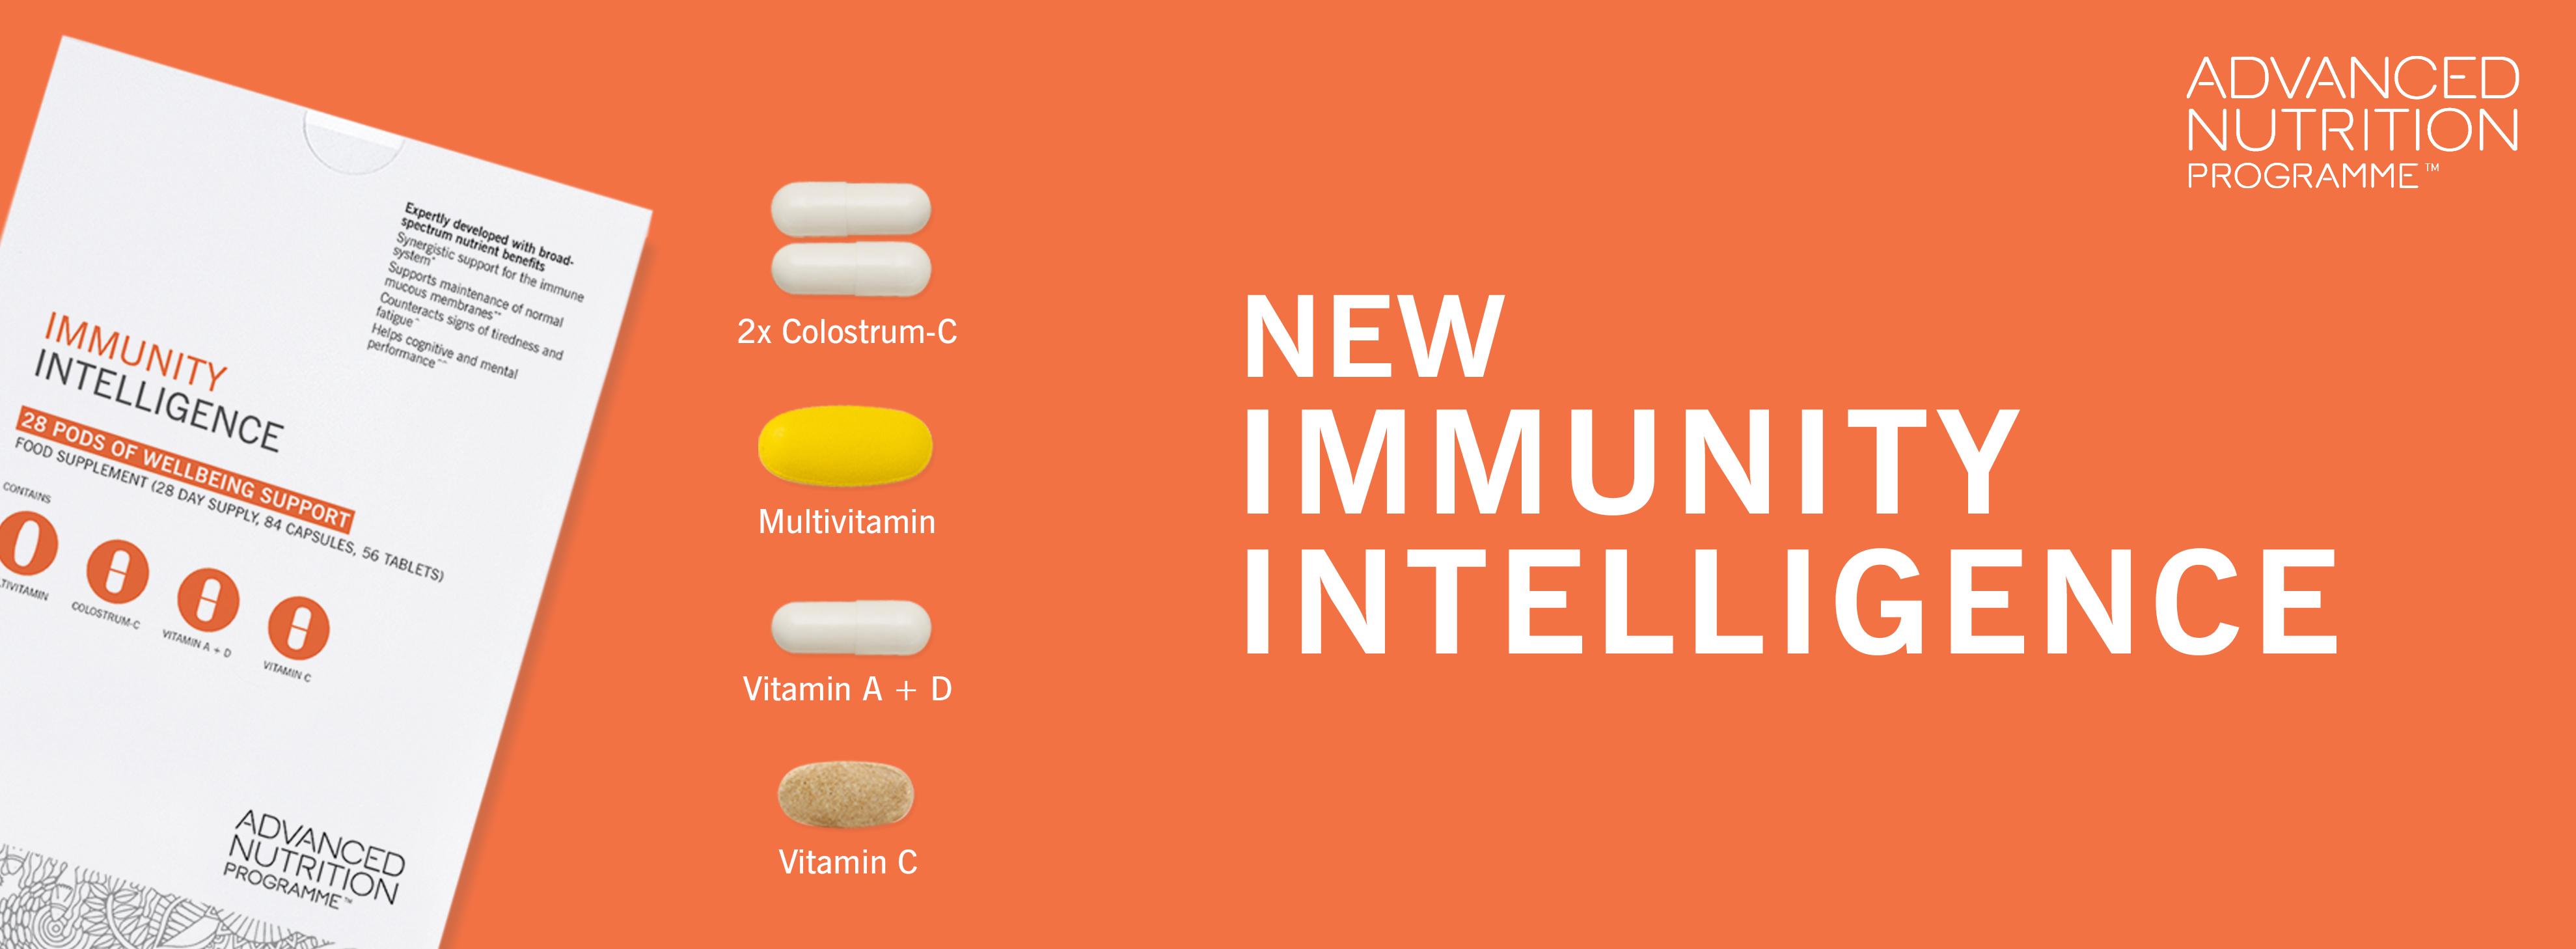 Advanced Nutrition Programme - Immunity Intelligence